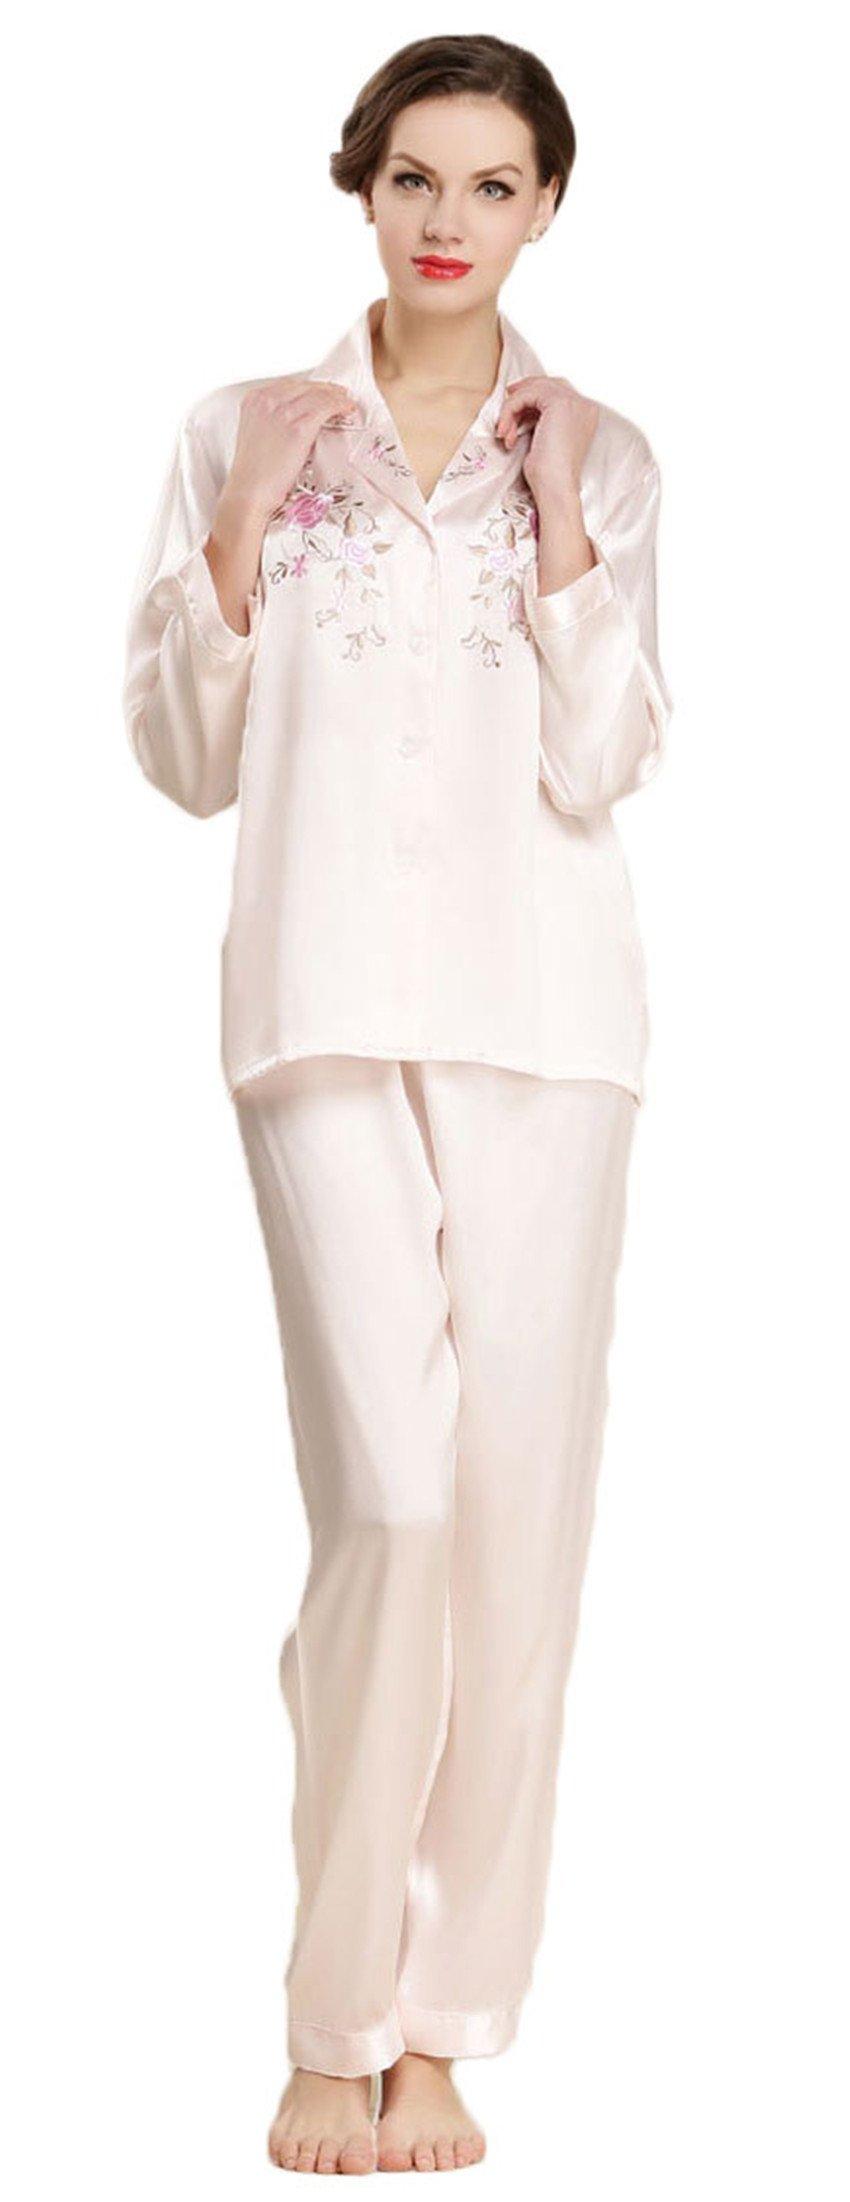 Women's Pure Mulberry Silk Pajama Set Embroidered Classic Luxury Sleepwear qianfen M